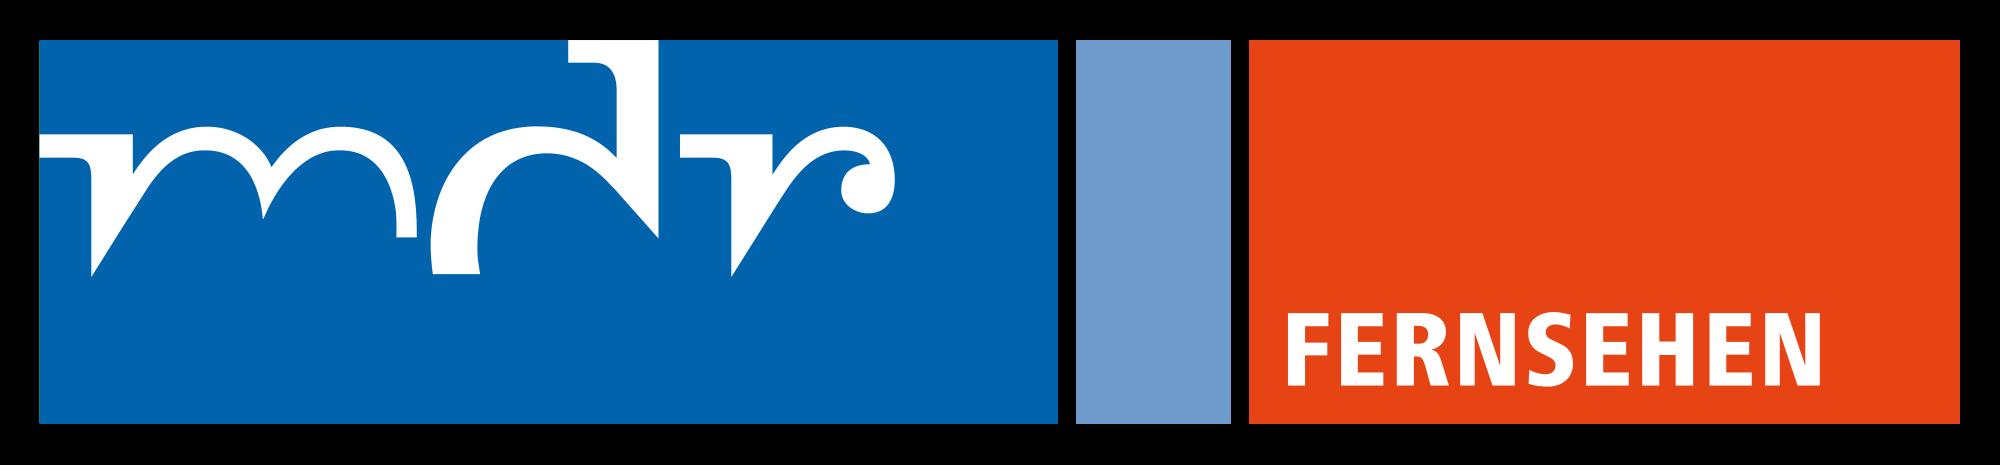 Mdr-fernsehen-logo.svg